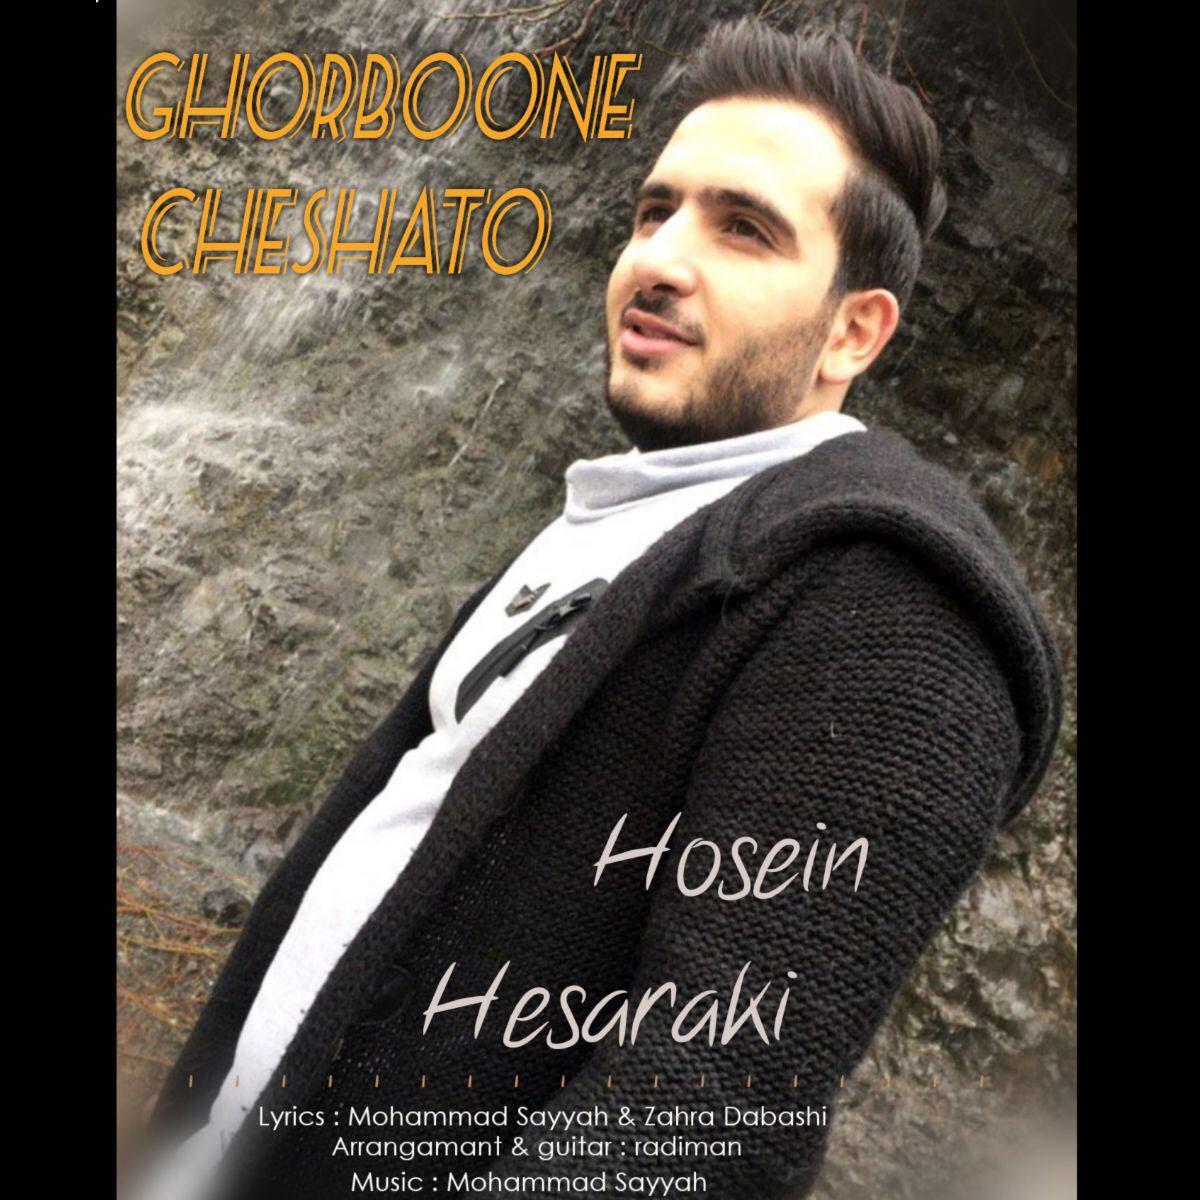 Hosein Hesaraki – Ghorbone Cheshato